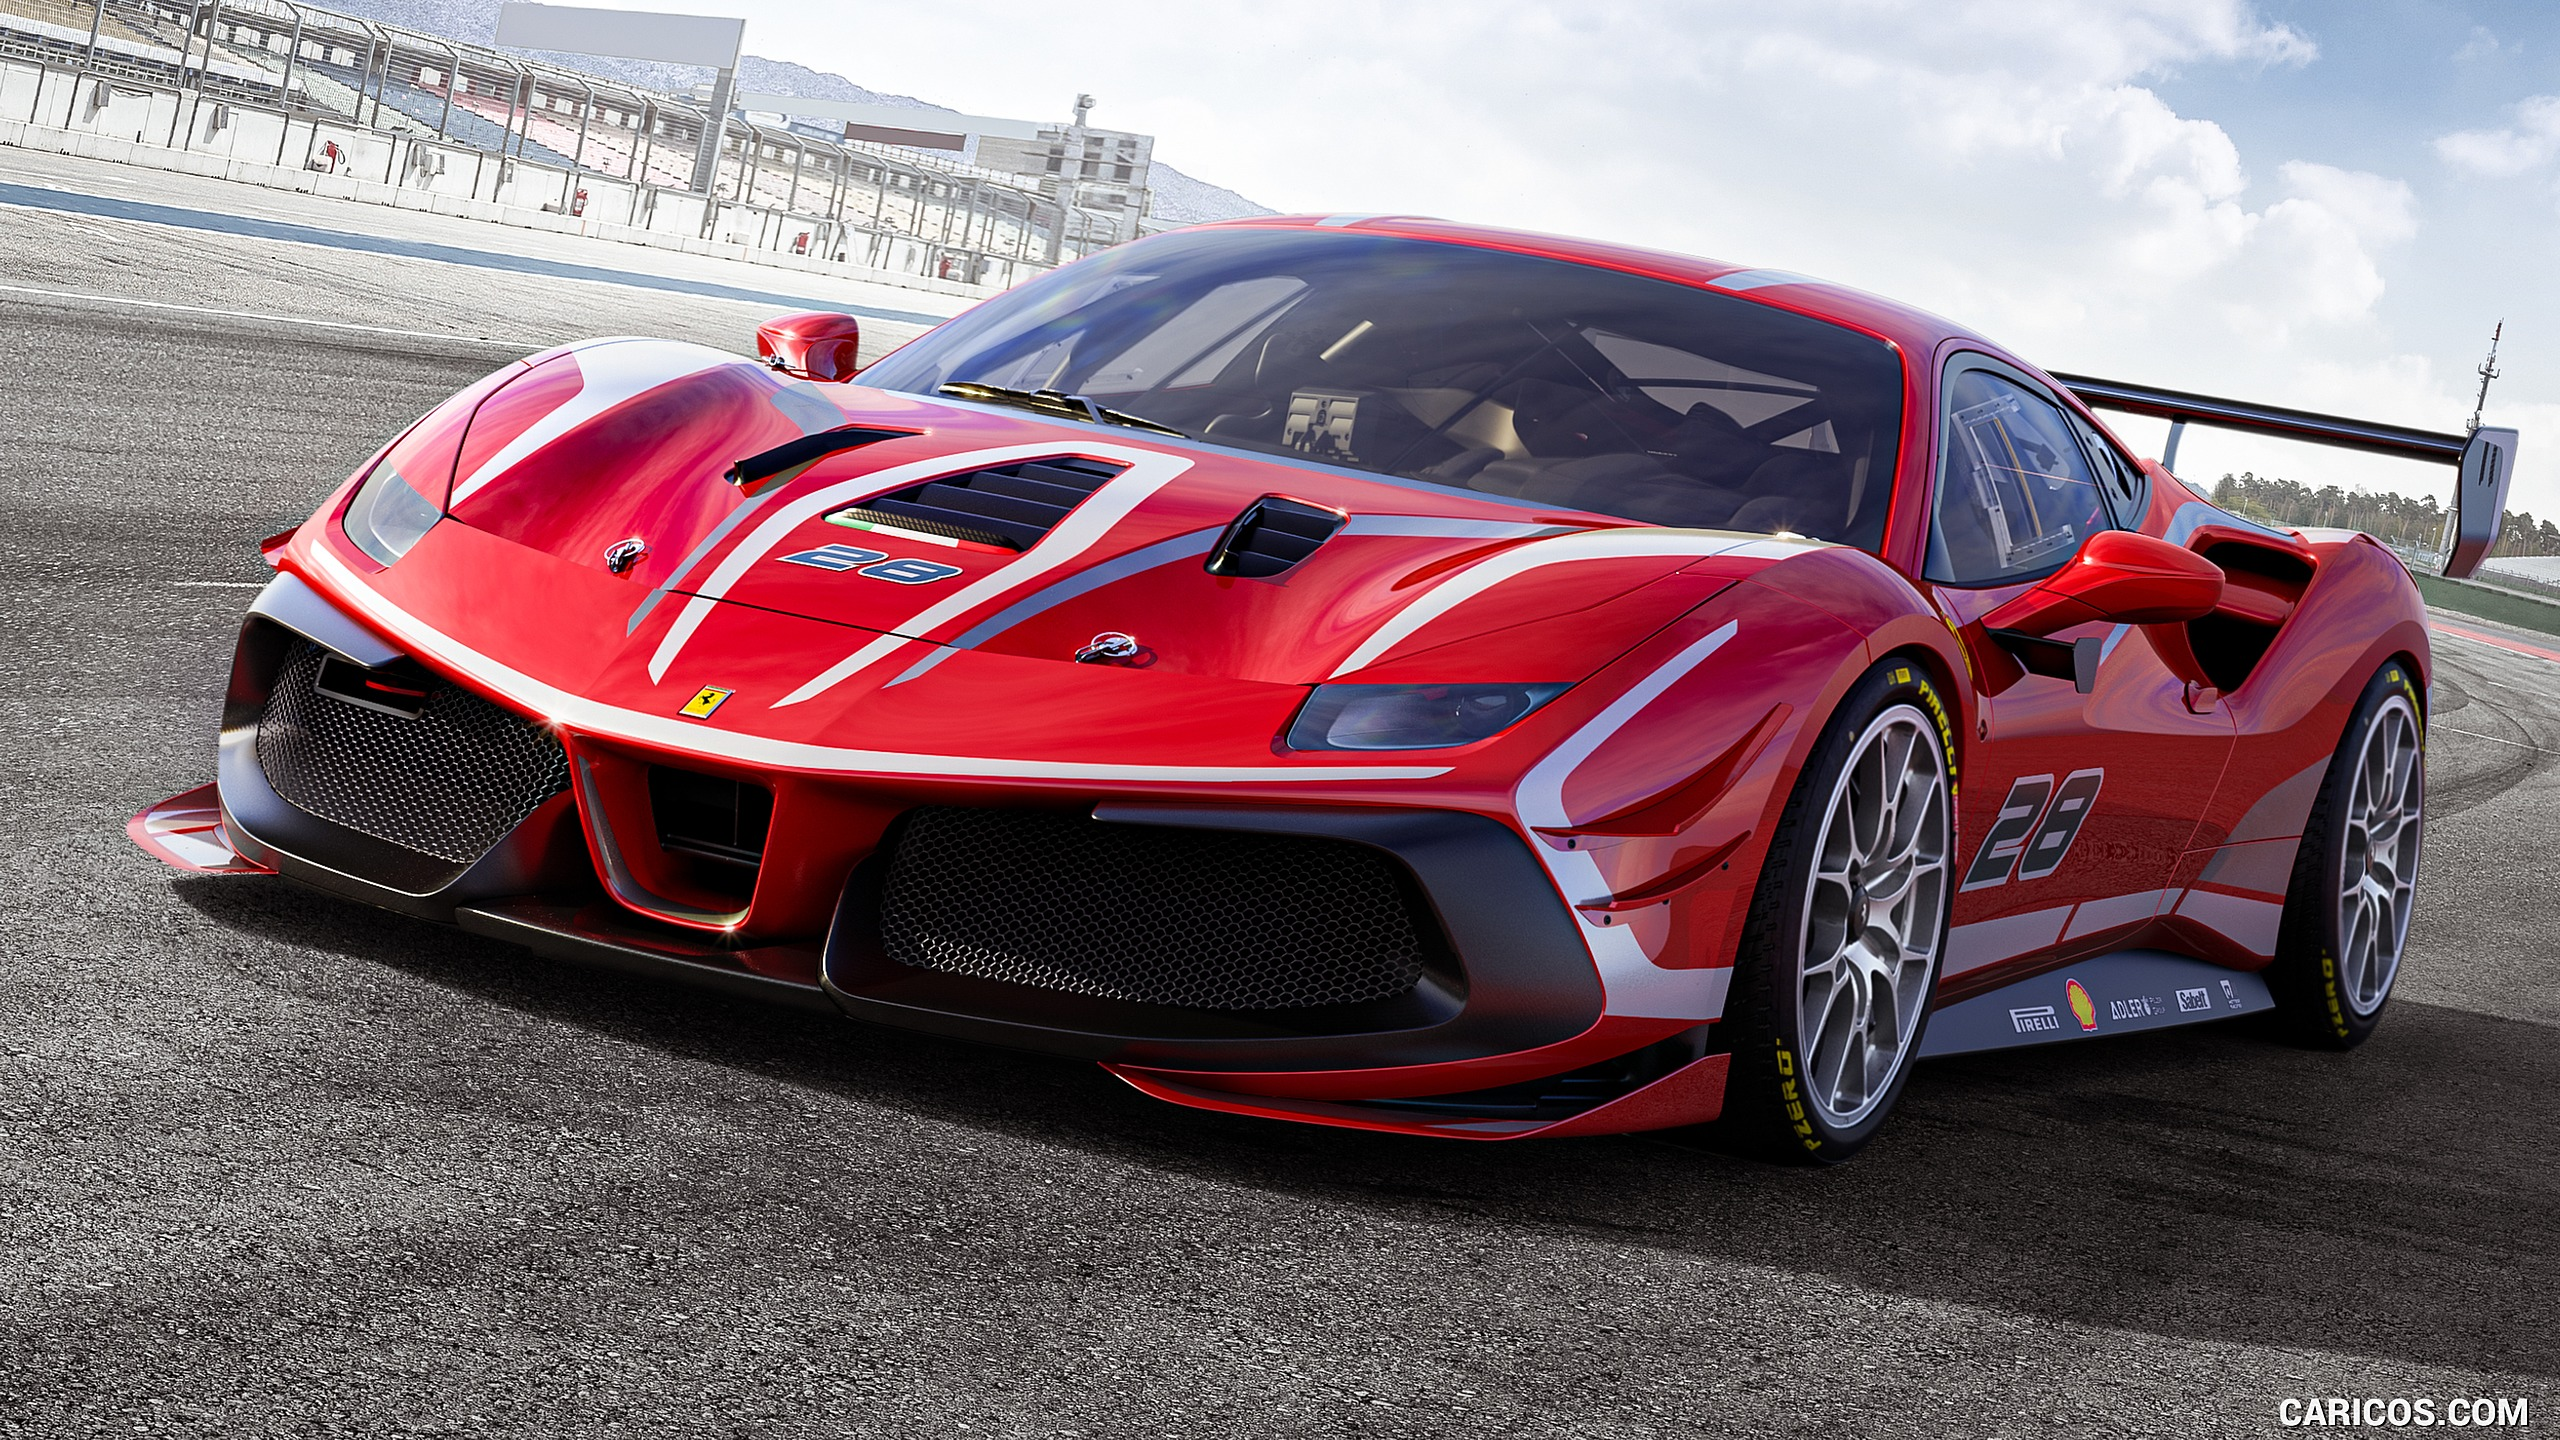 2020 Ferrari 488 Challenge Evo   Front Three Quarter HD Wallpaper 1 2560x1440